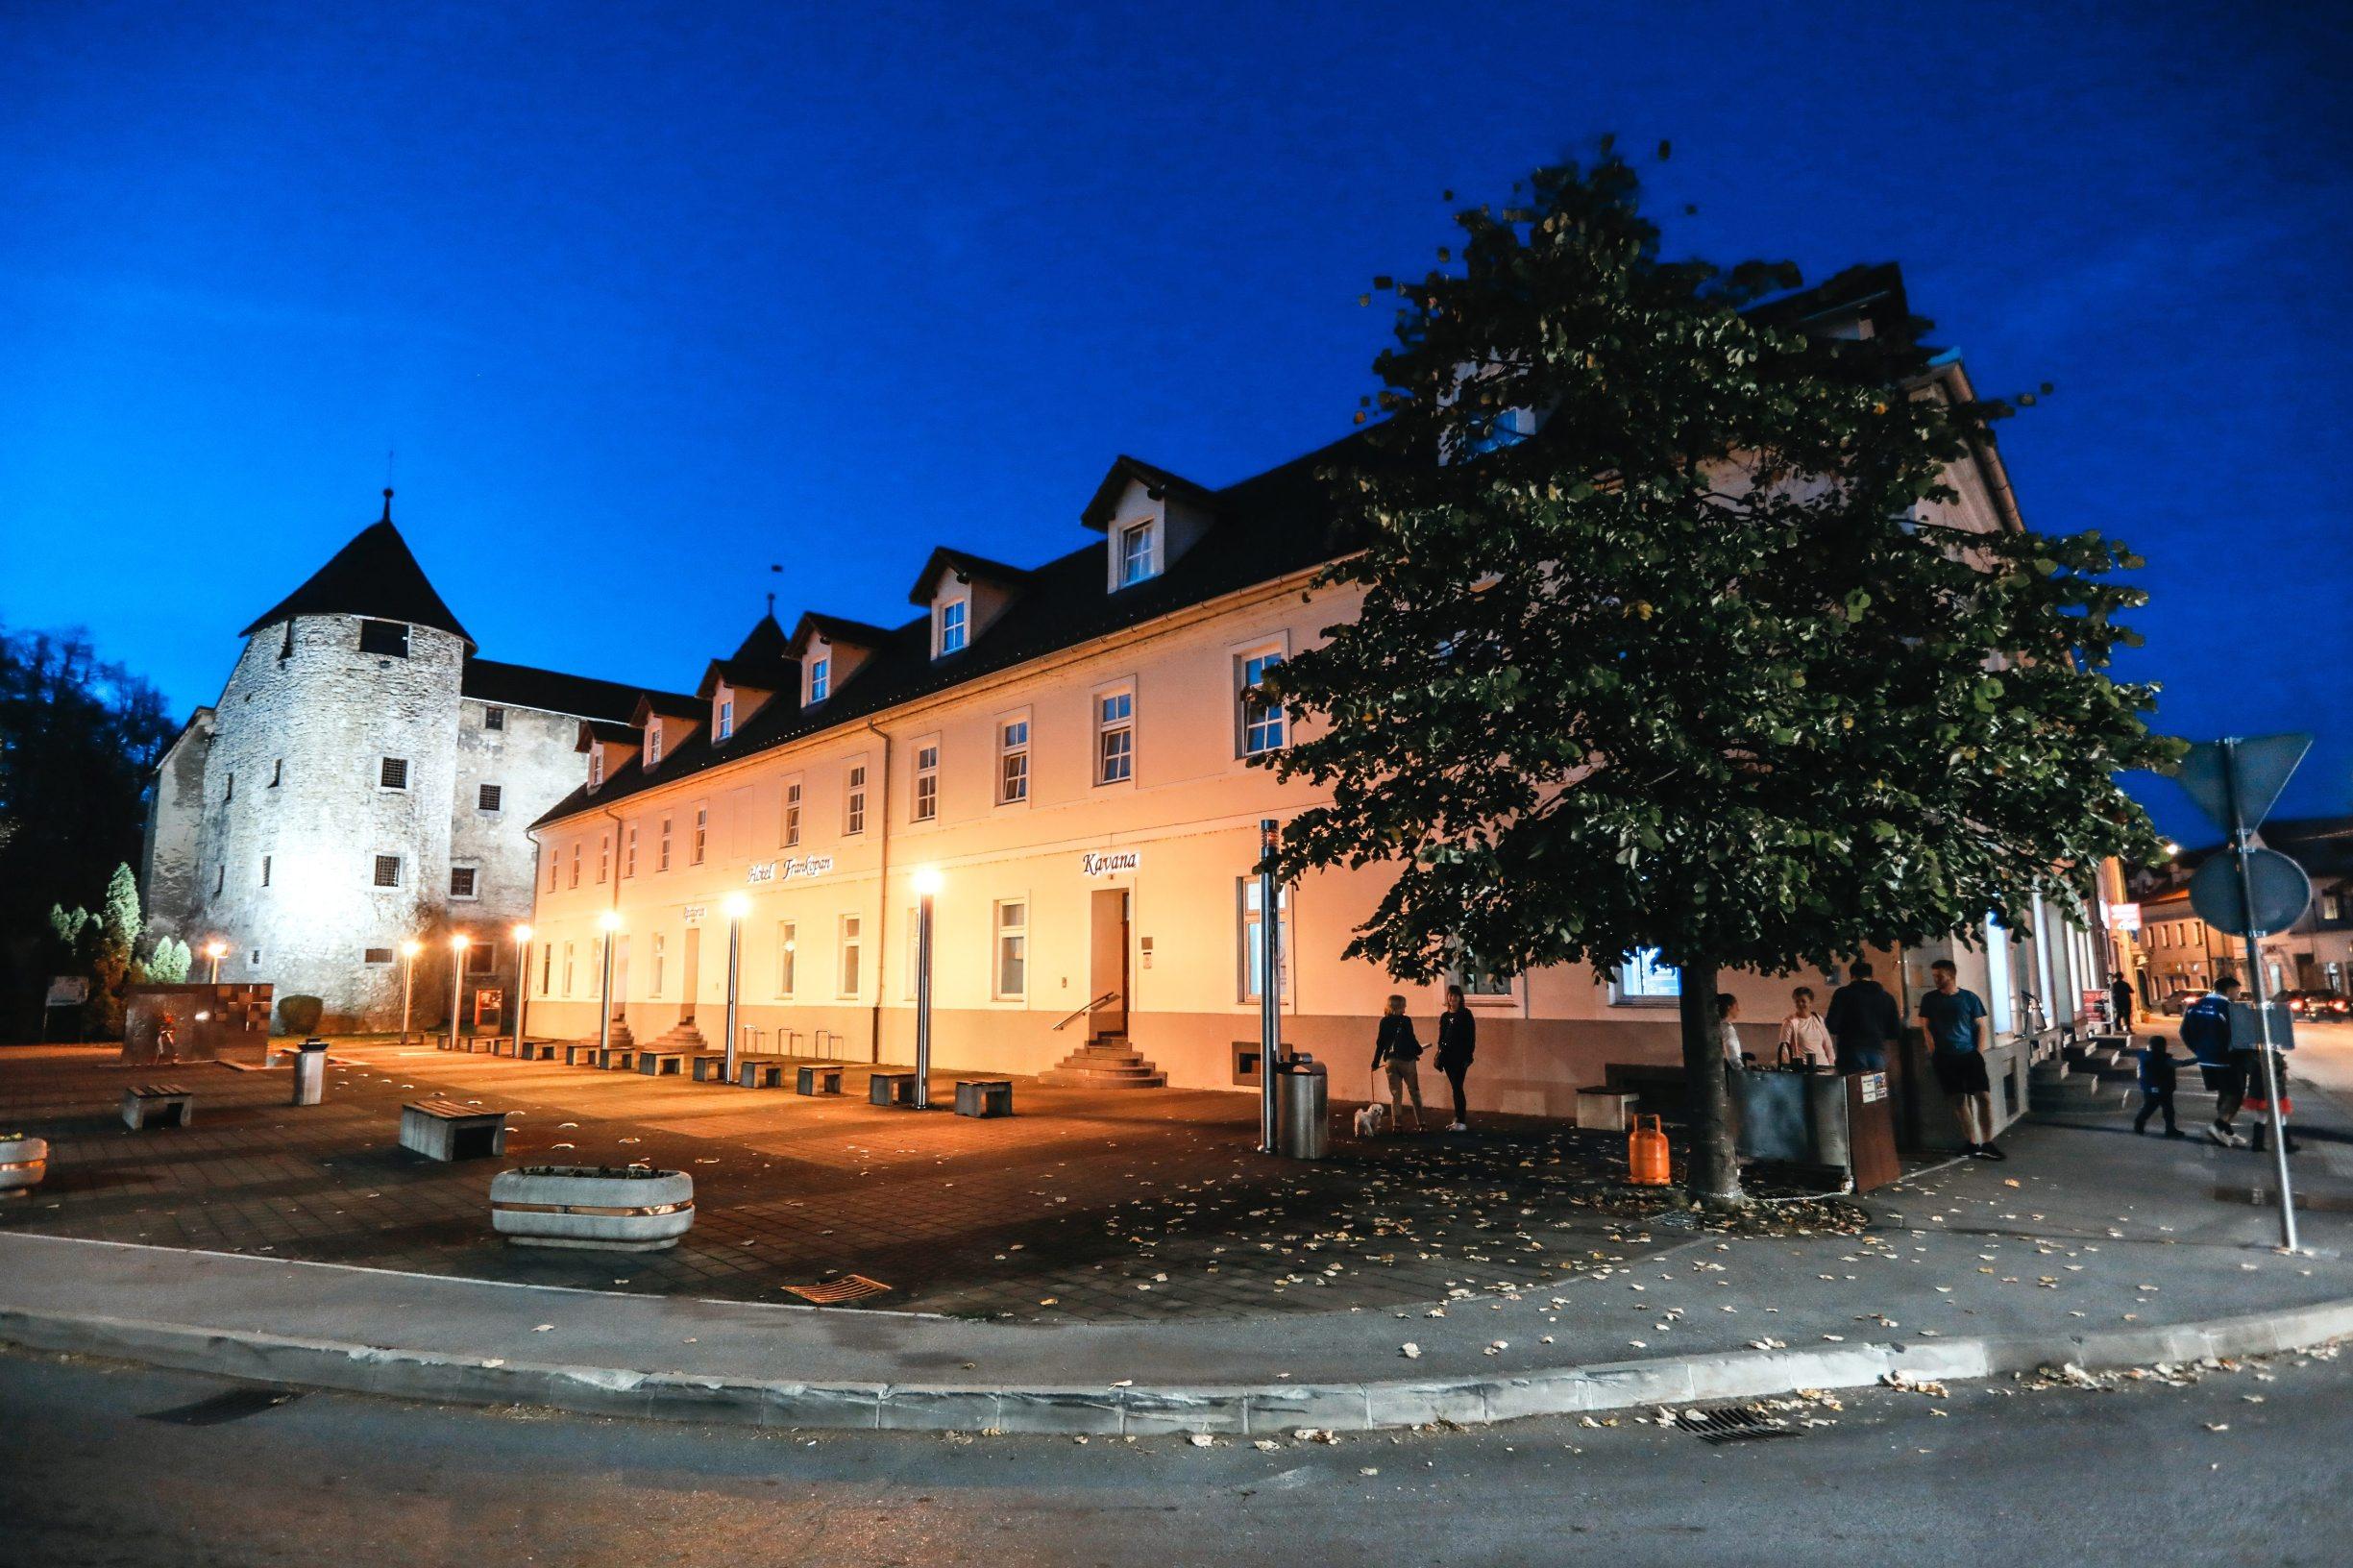 Ogulin, 281019 Reportaza o Ogulinu. Na fotografiji Hotel Frankopan i Frankopanski kastel. Foto: Danijel Soldo / CROPIX